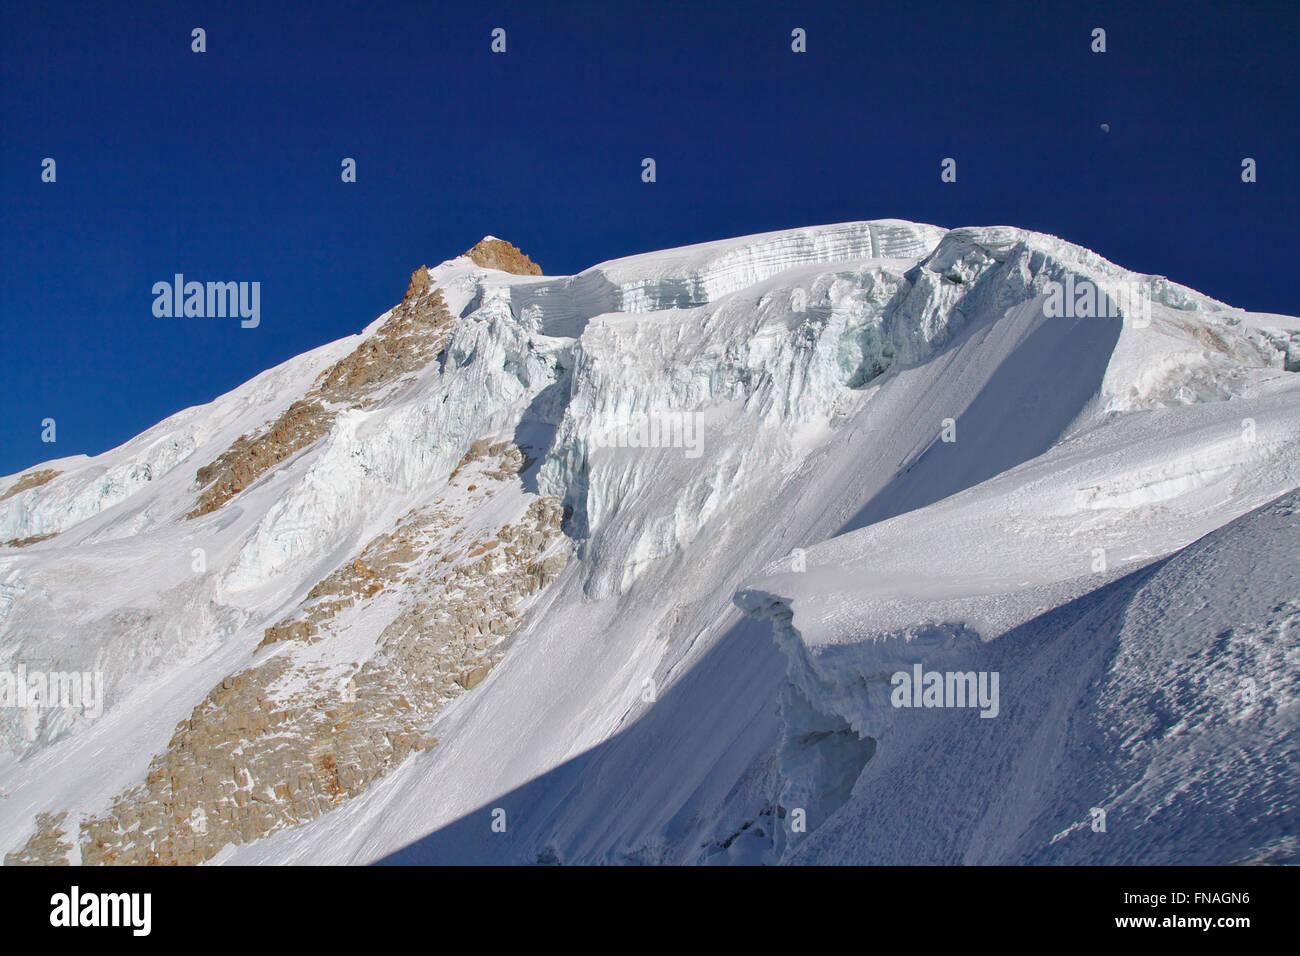 Side summit of Huayna Potosi, Cordillera Real, Bolivia - Stock Image